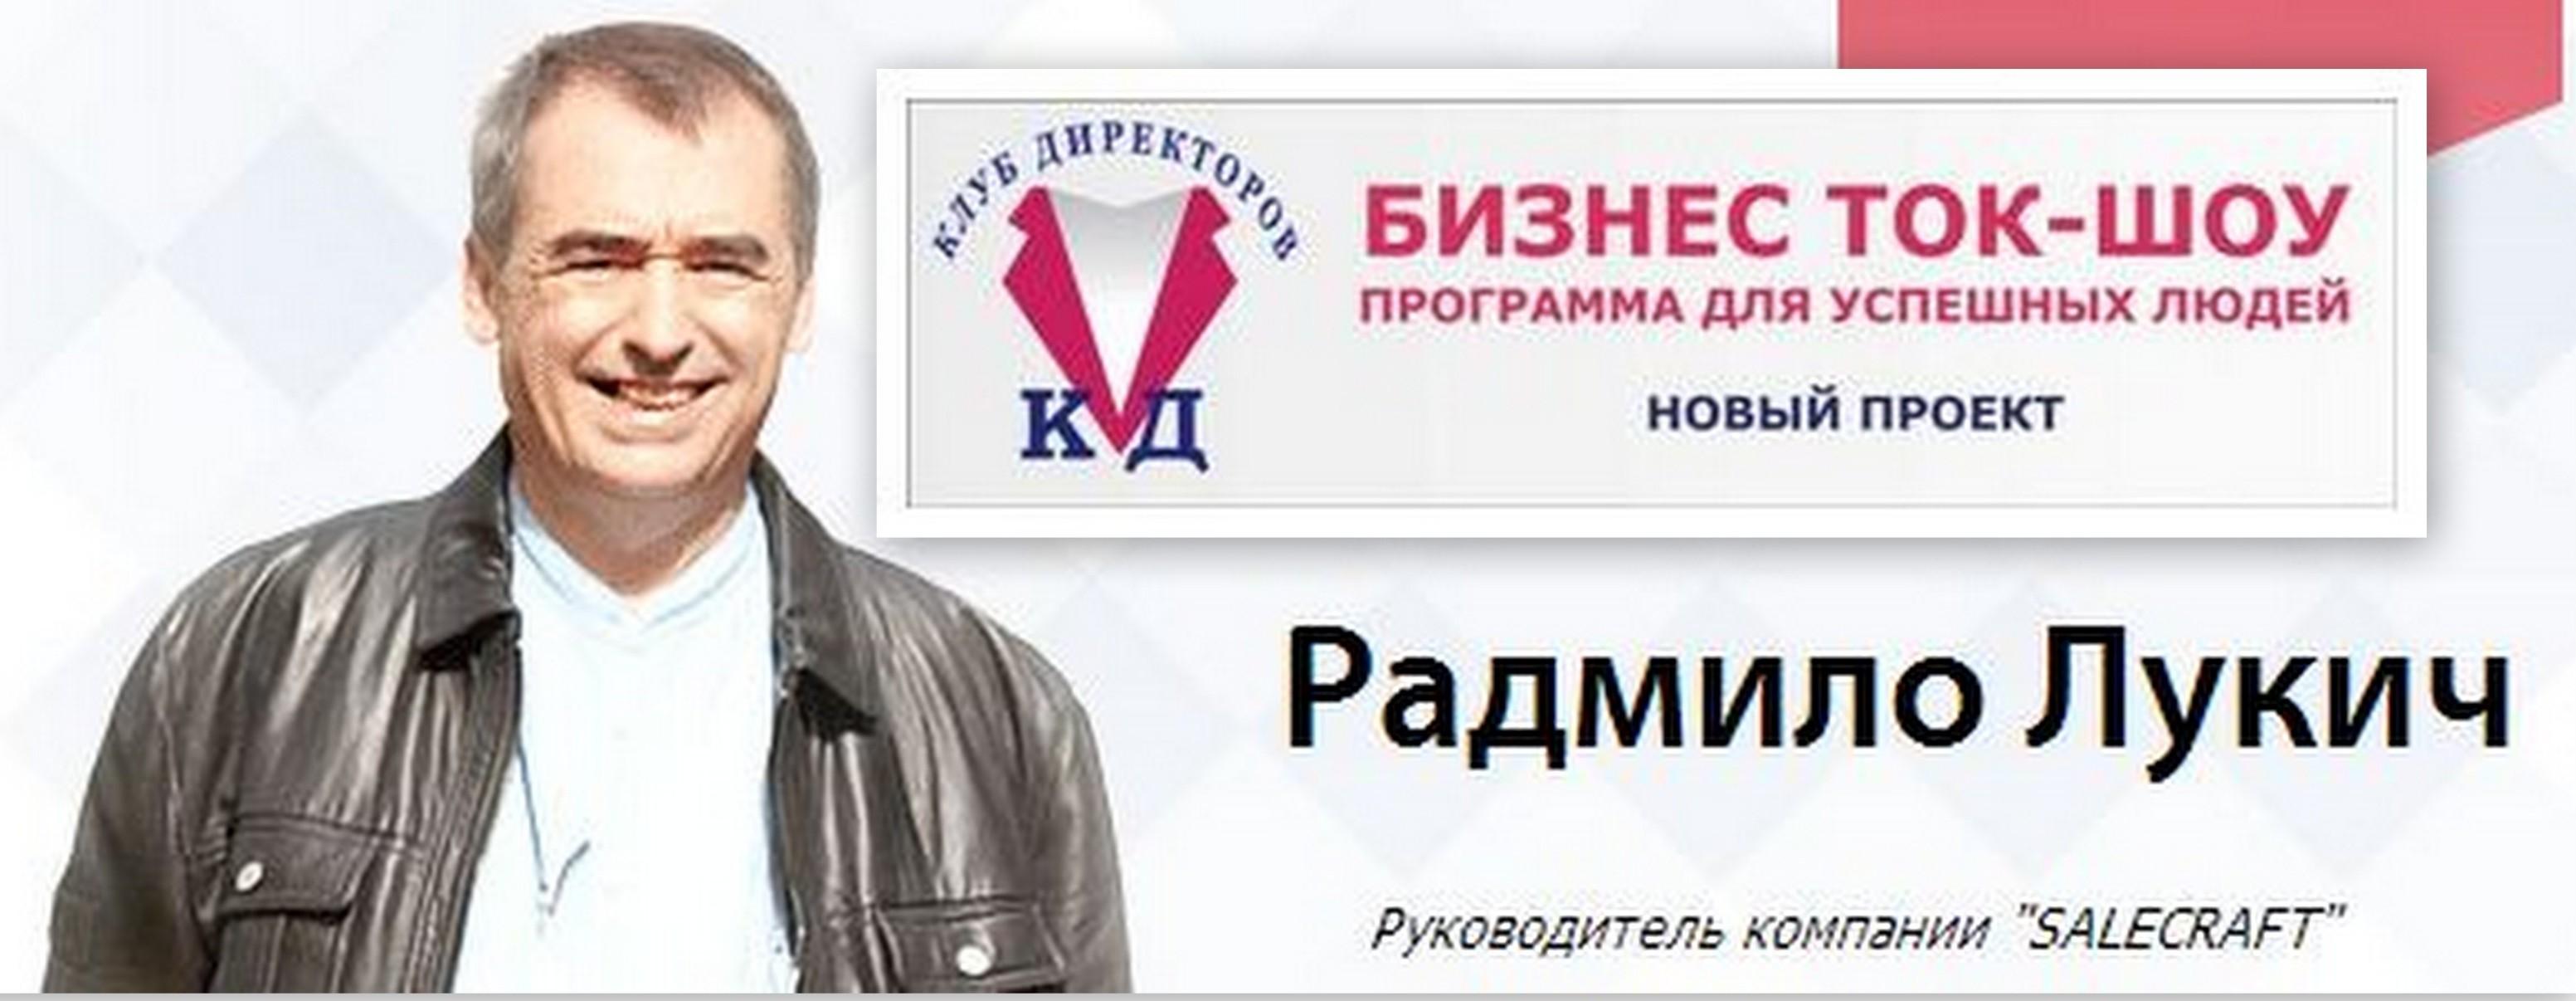 2012-08-131